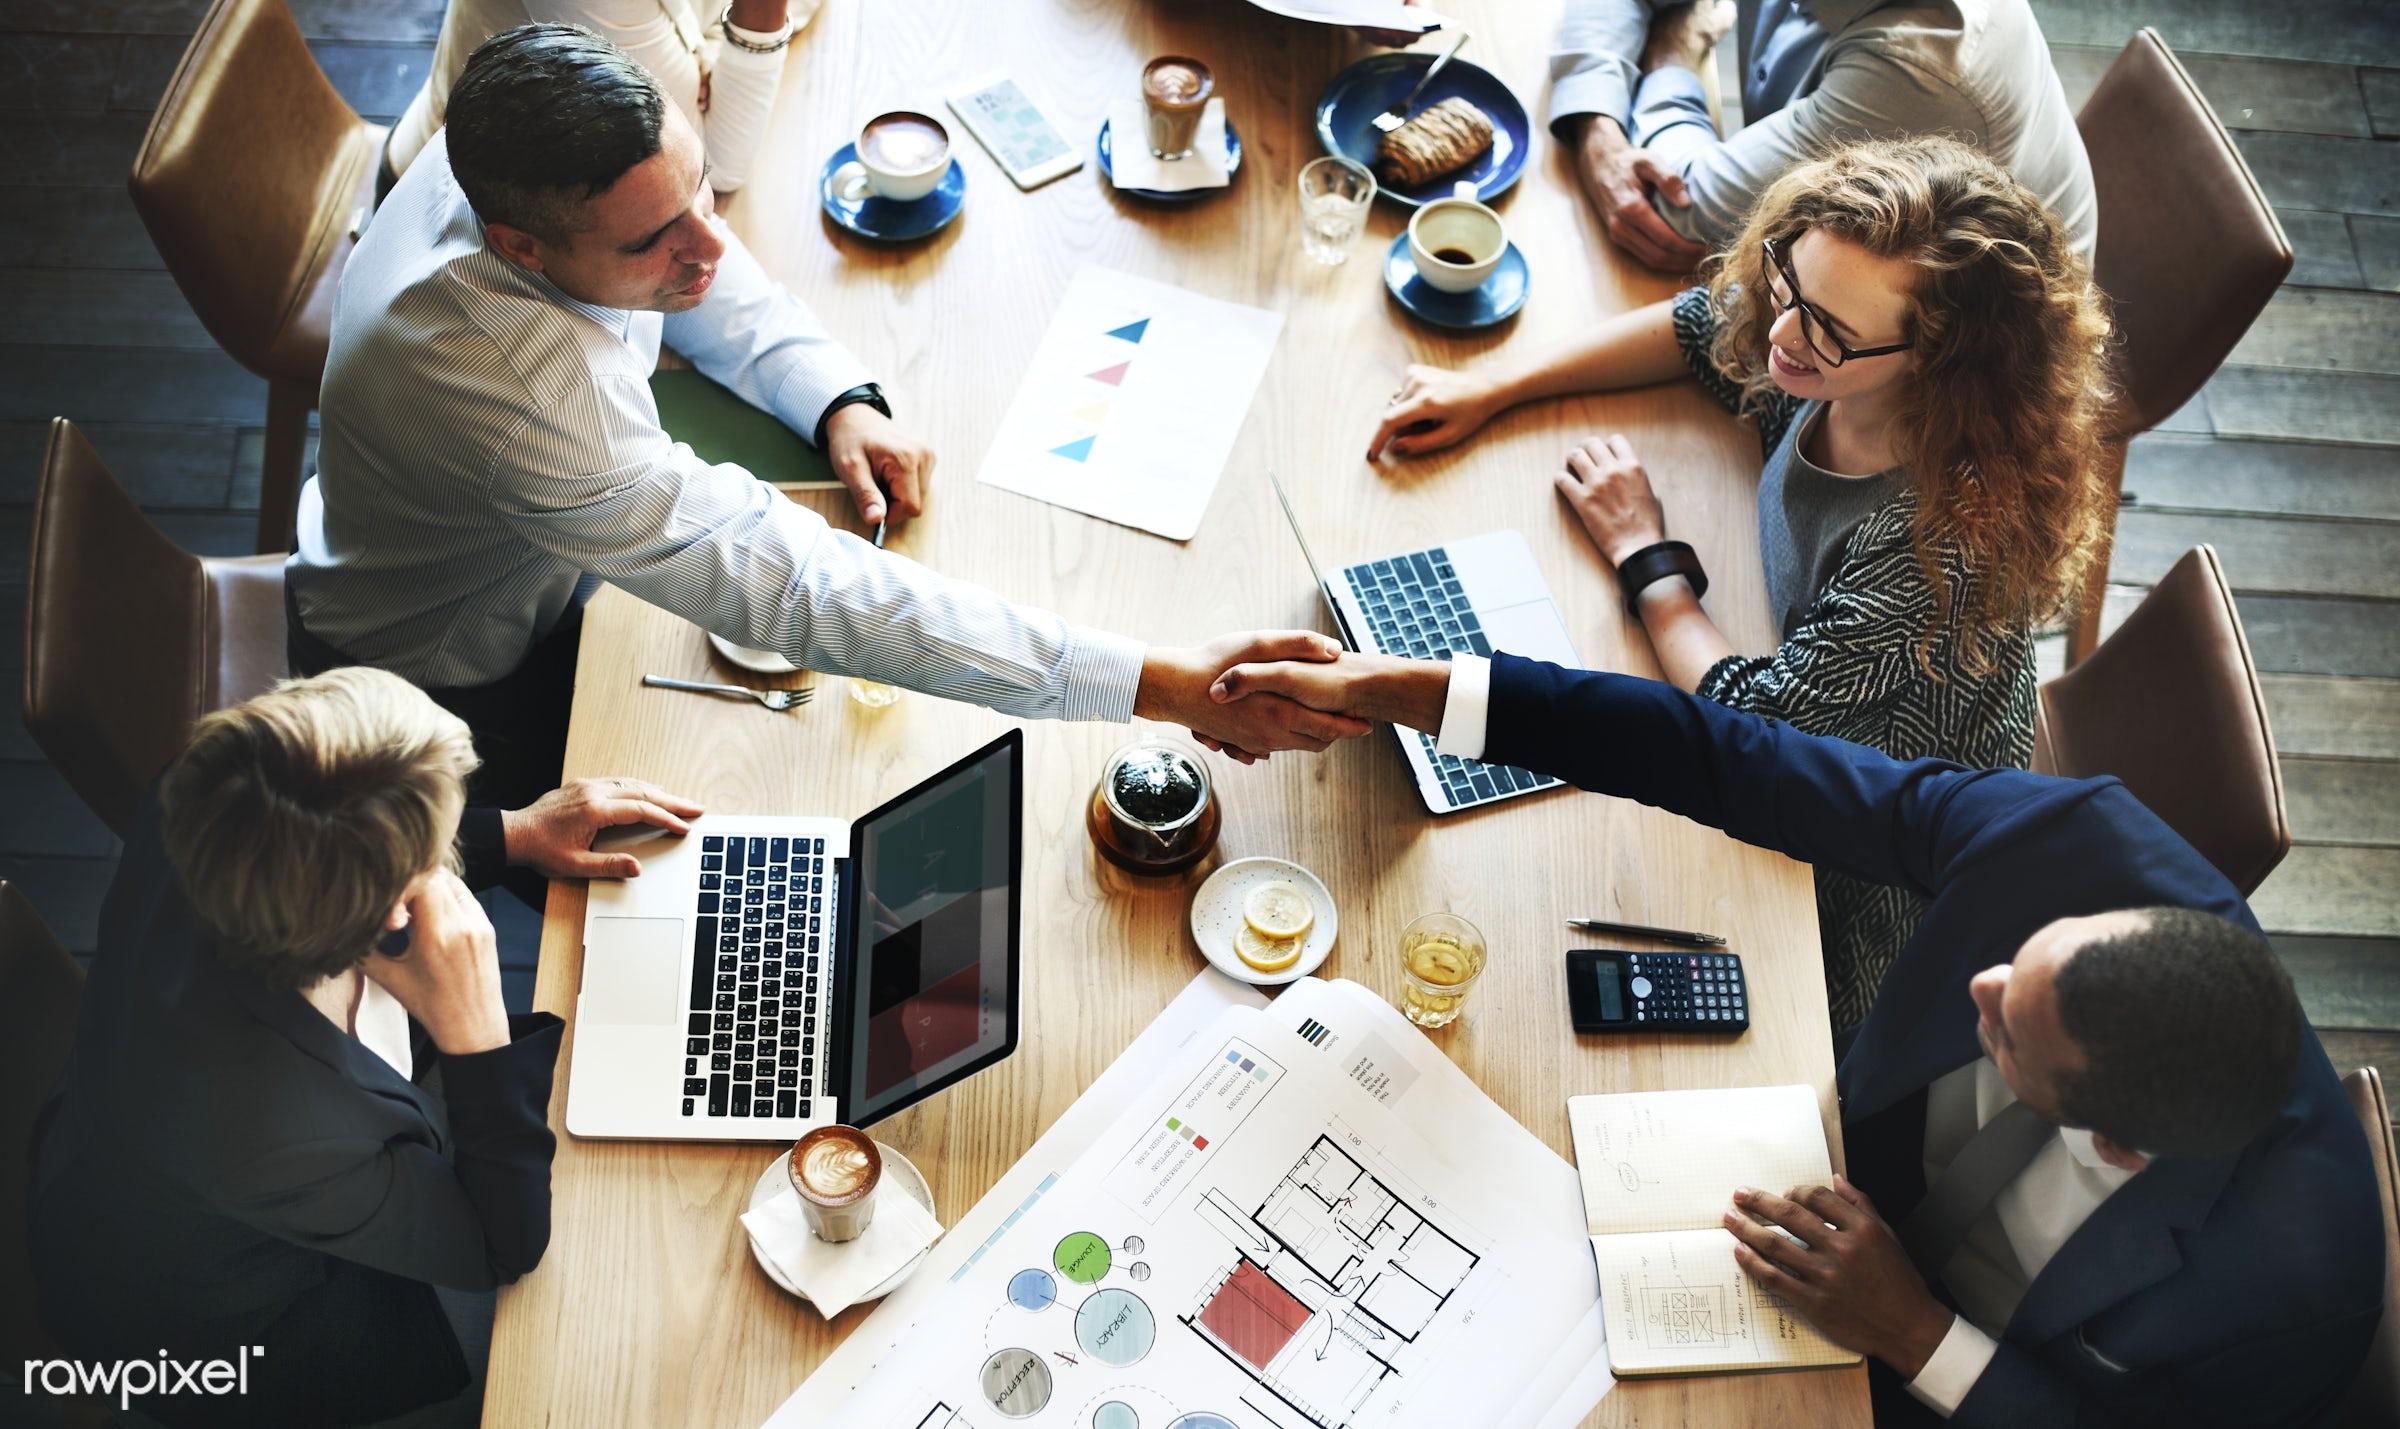 agreement, analysis, architecture, blueprint, brainstorming, business, business people, businessmen, businesswomen, cafe,...